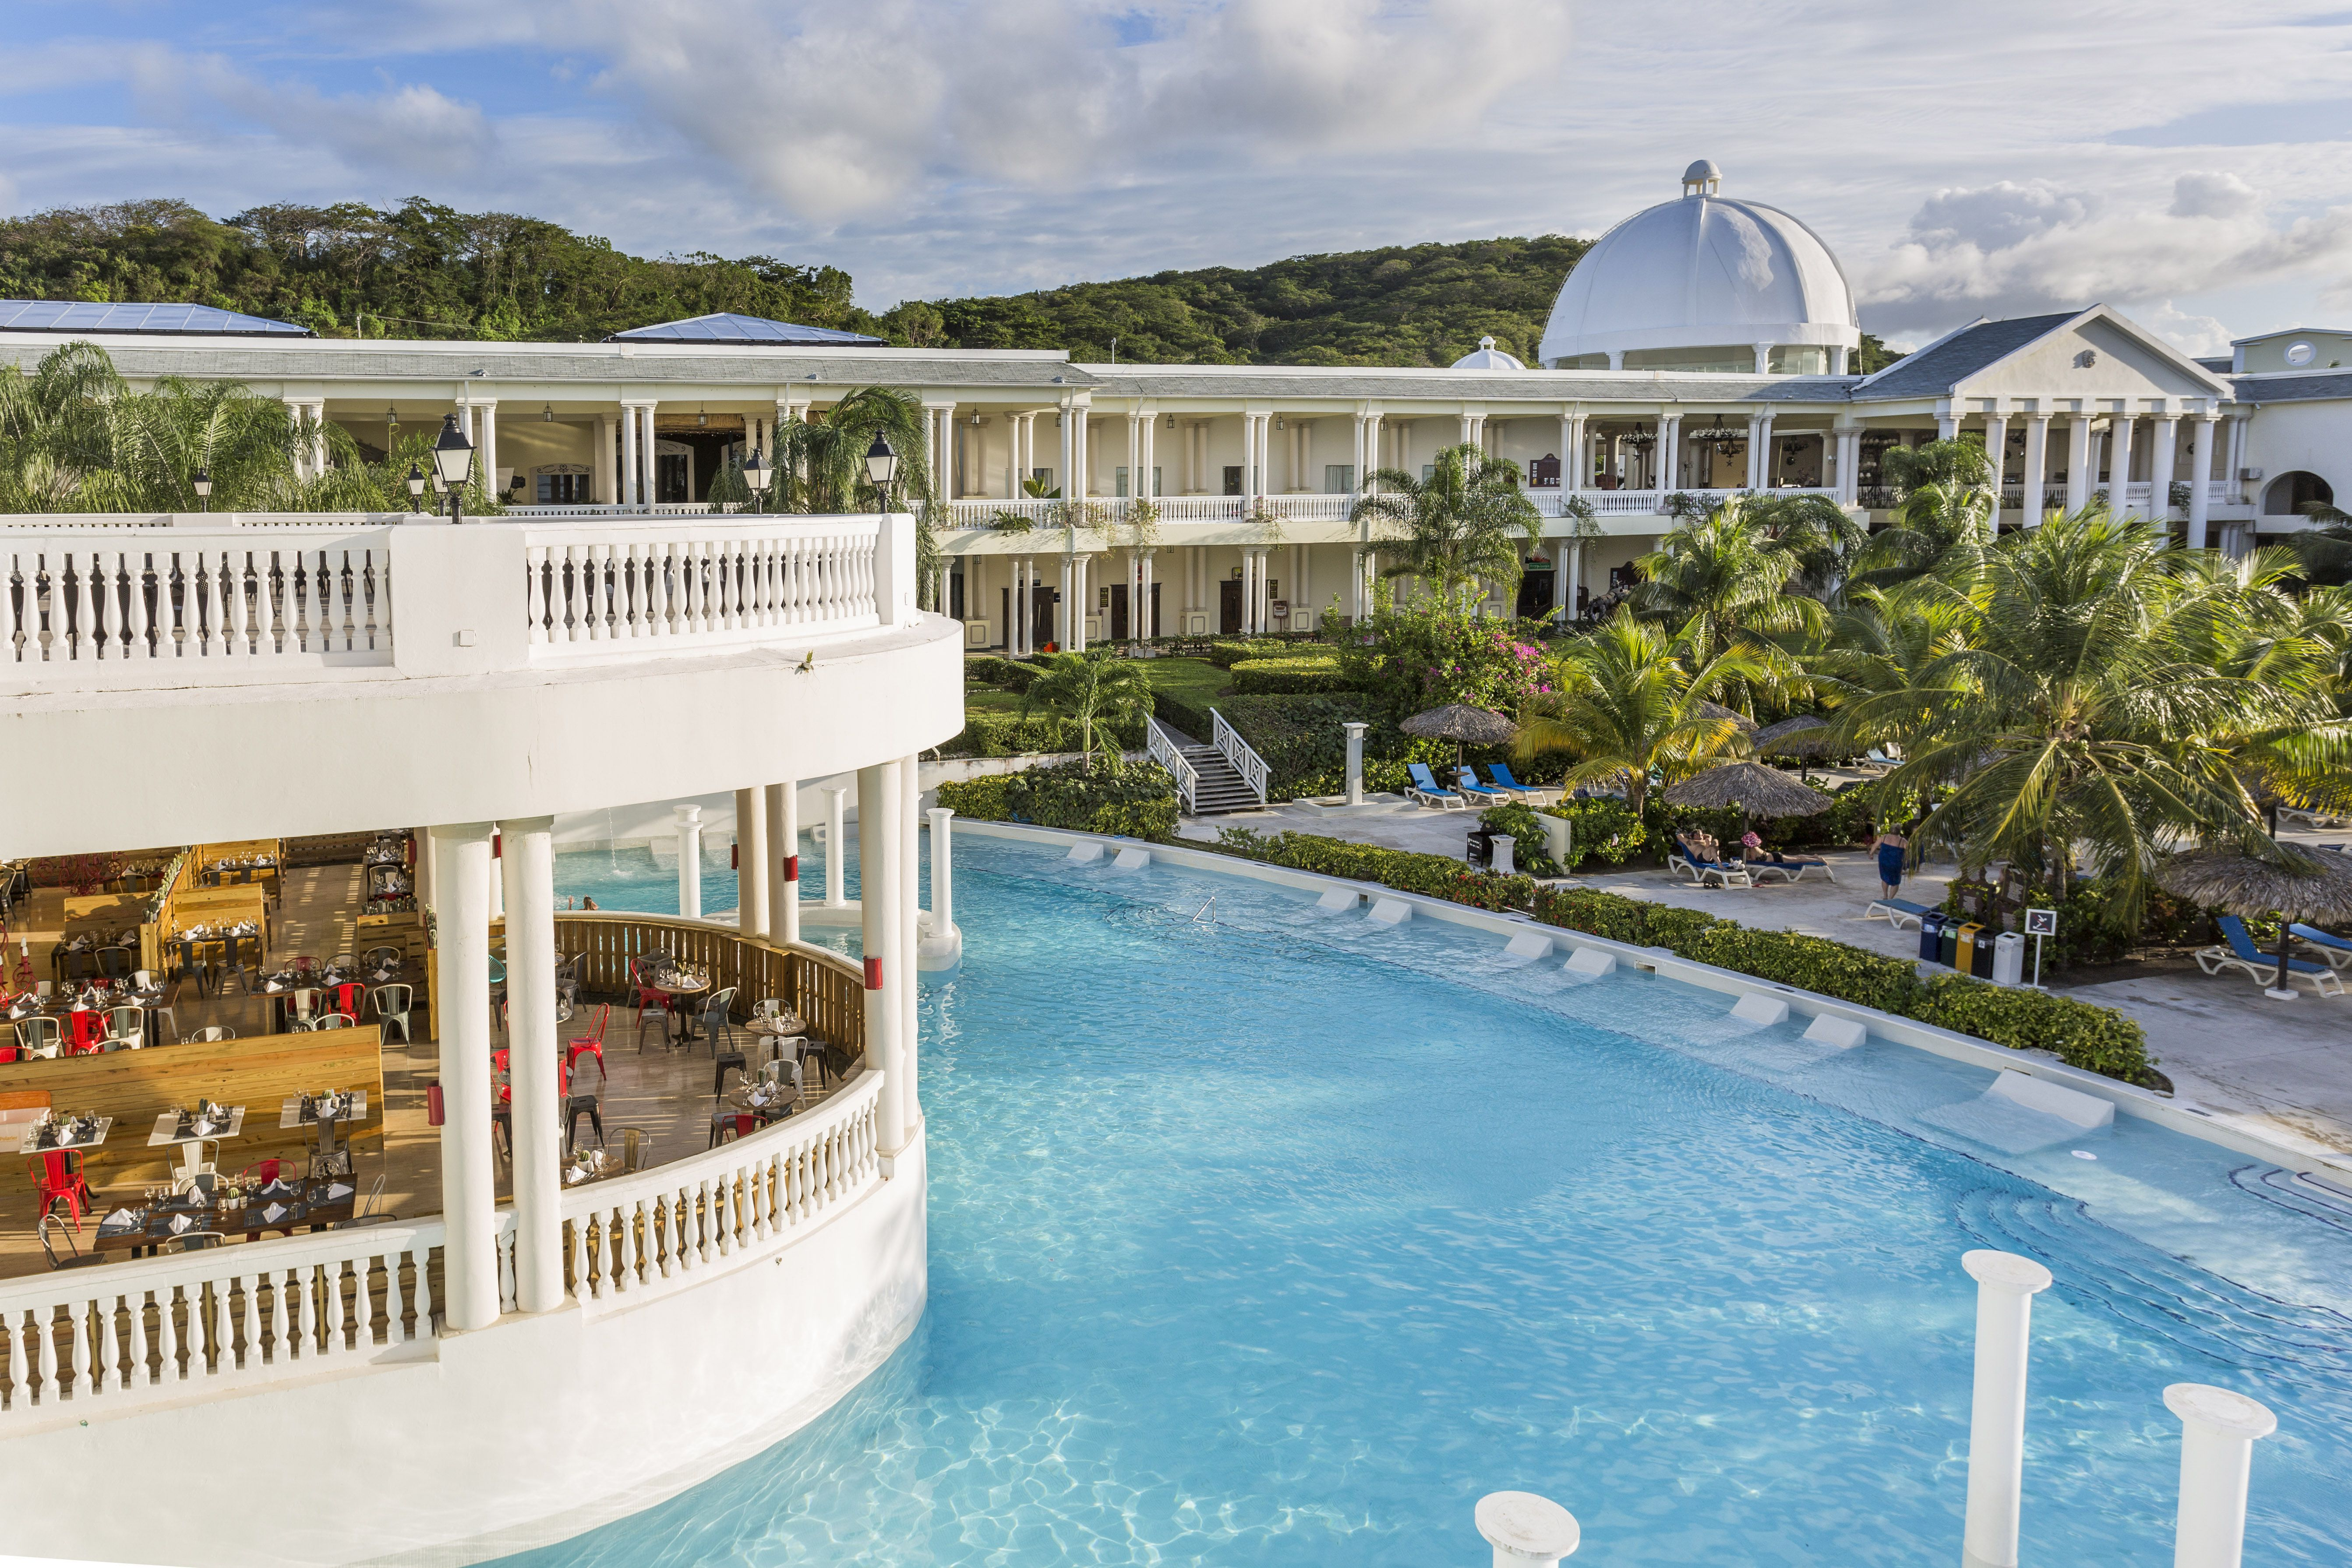 Grand Palladium Lady Hamilton Pool Best Jamaica All Inclusive Beach Resorts